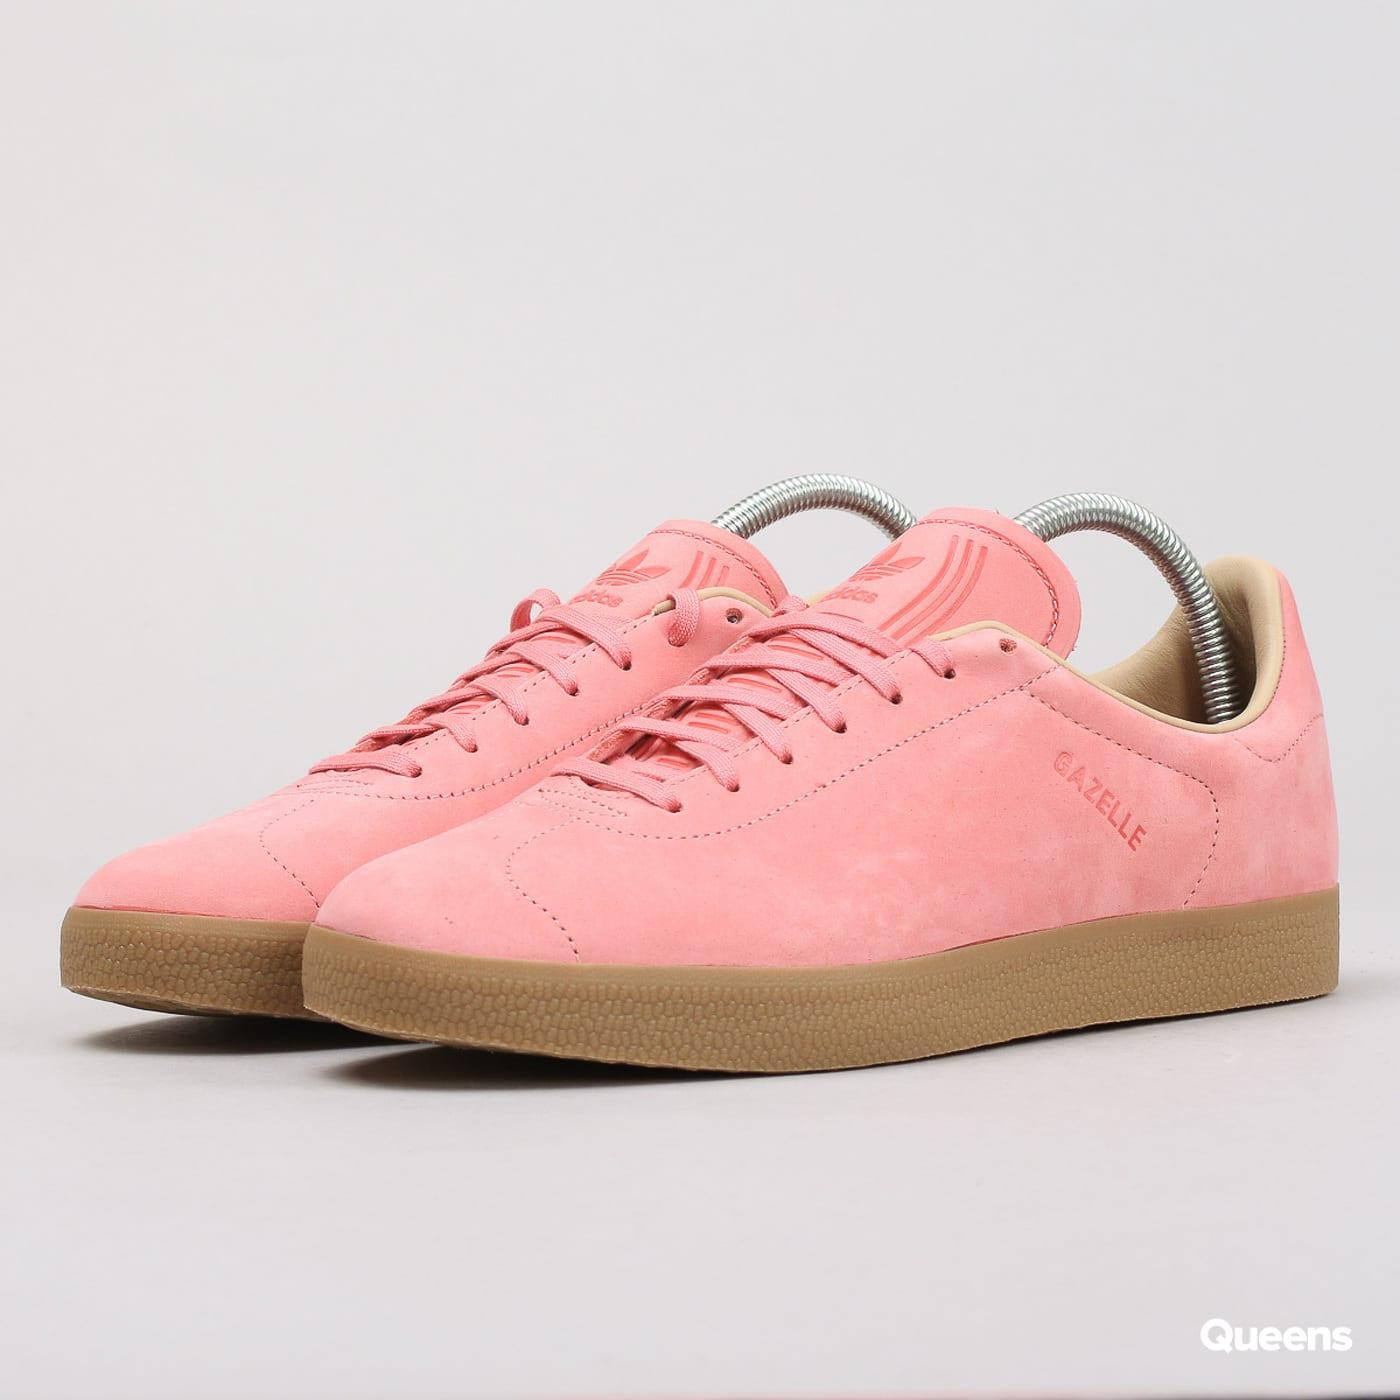 Schuhe adidas Gazelle Decon (CG3706)– Queens  Starker Wert